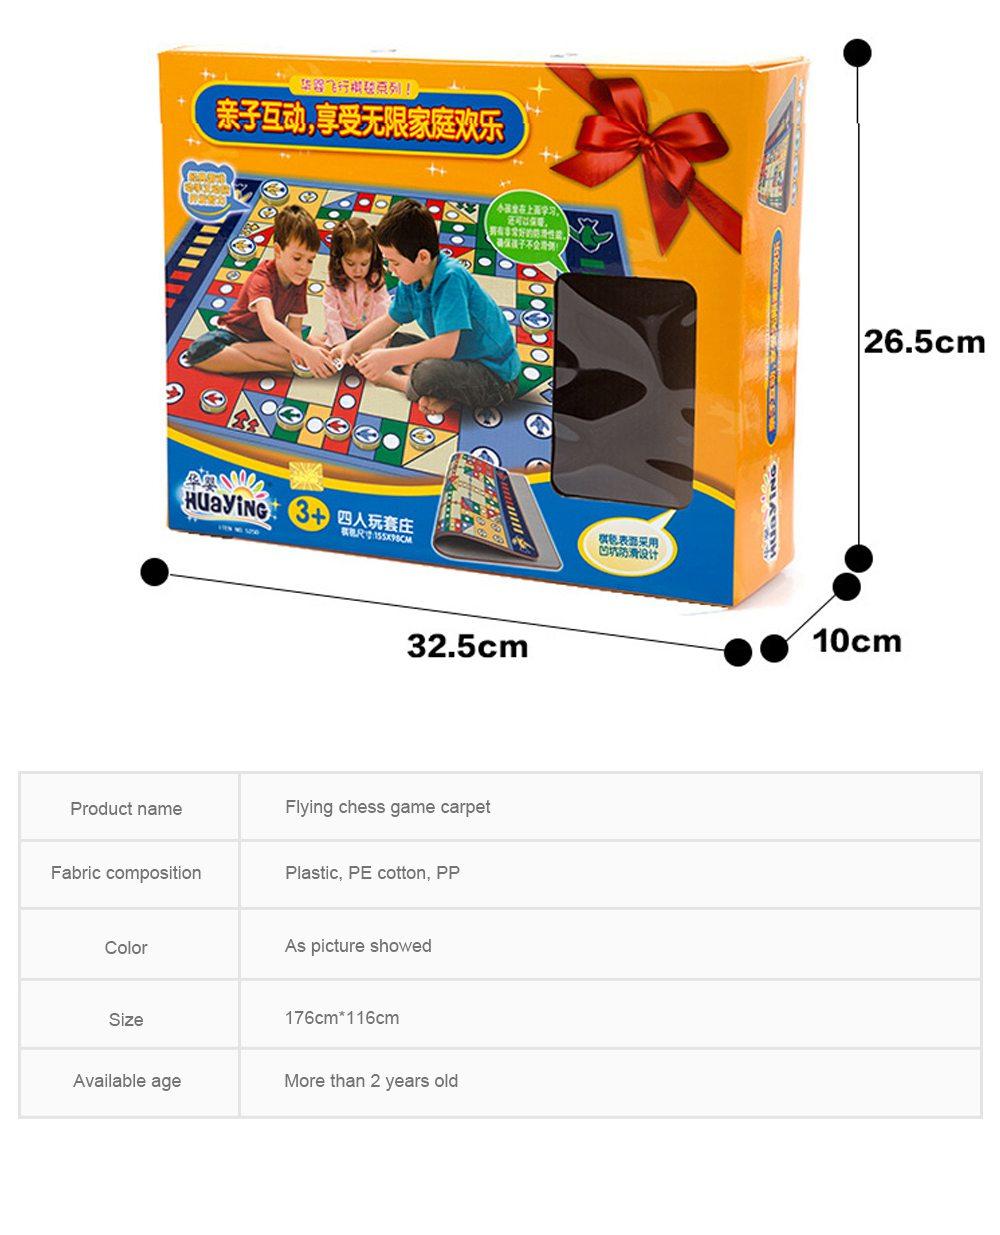 Flying Chess Carpet Desktop Large Flying Chess Game Pad, Chess Rug for Kid's Home Play, Soft Crawling Floor Mat for Children & Infants 6